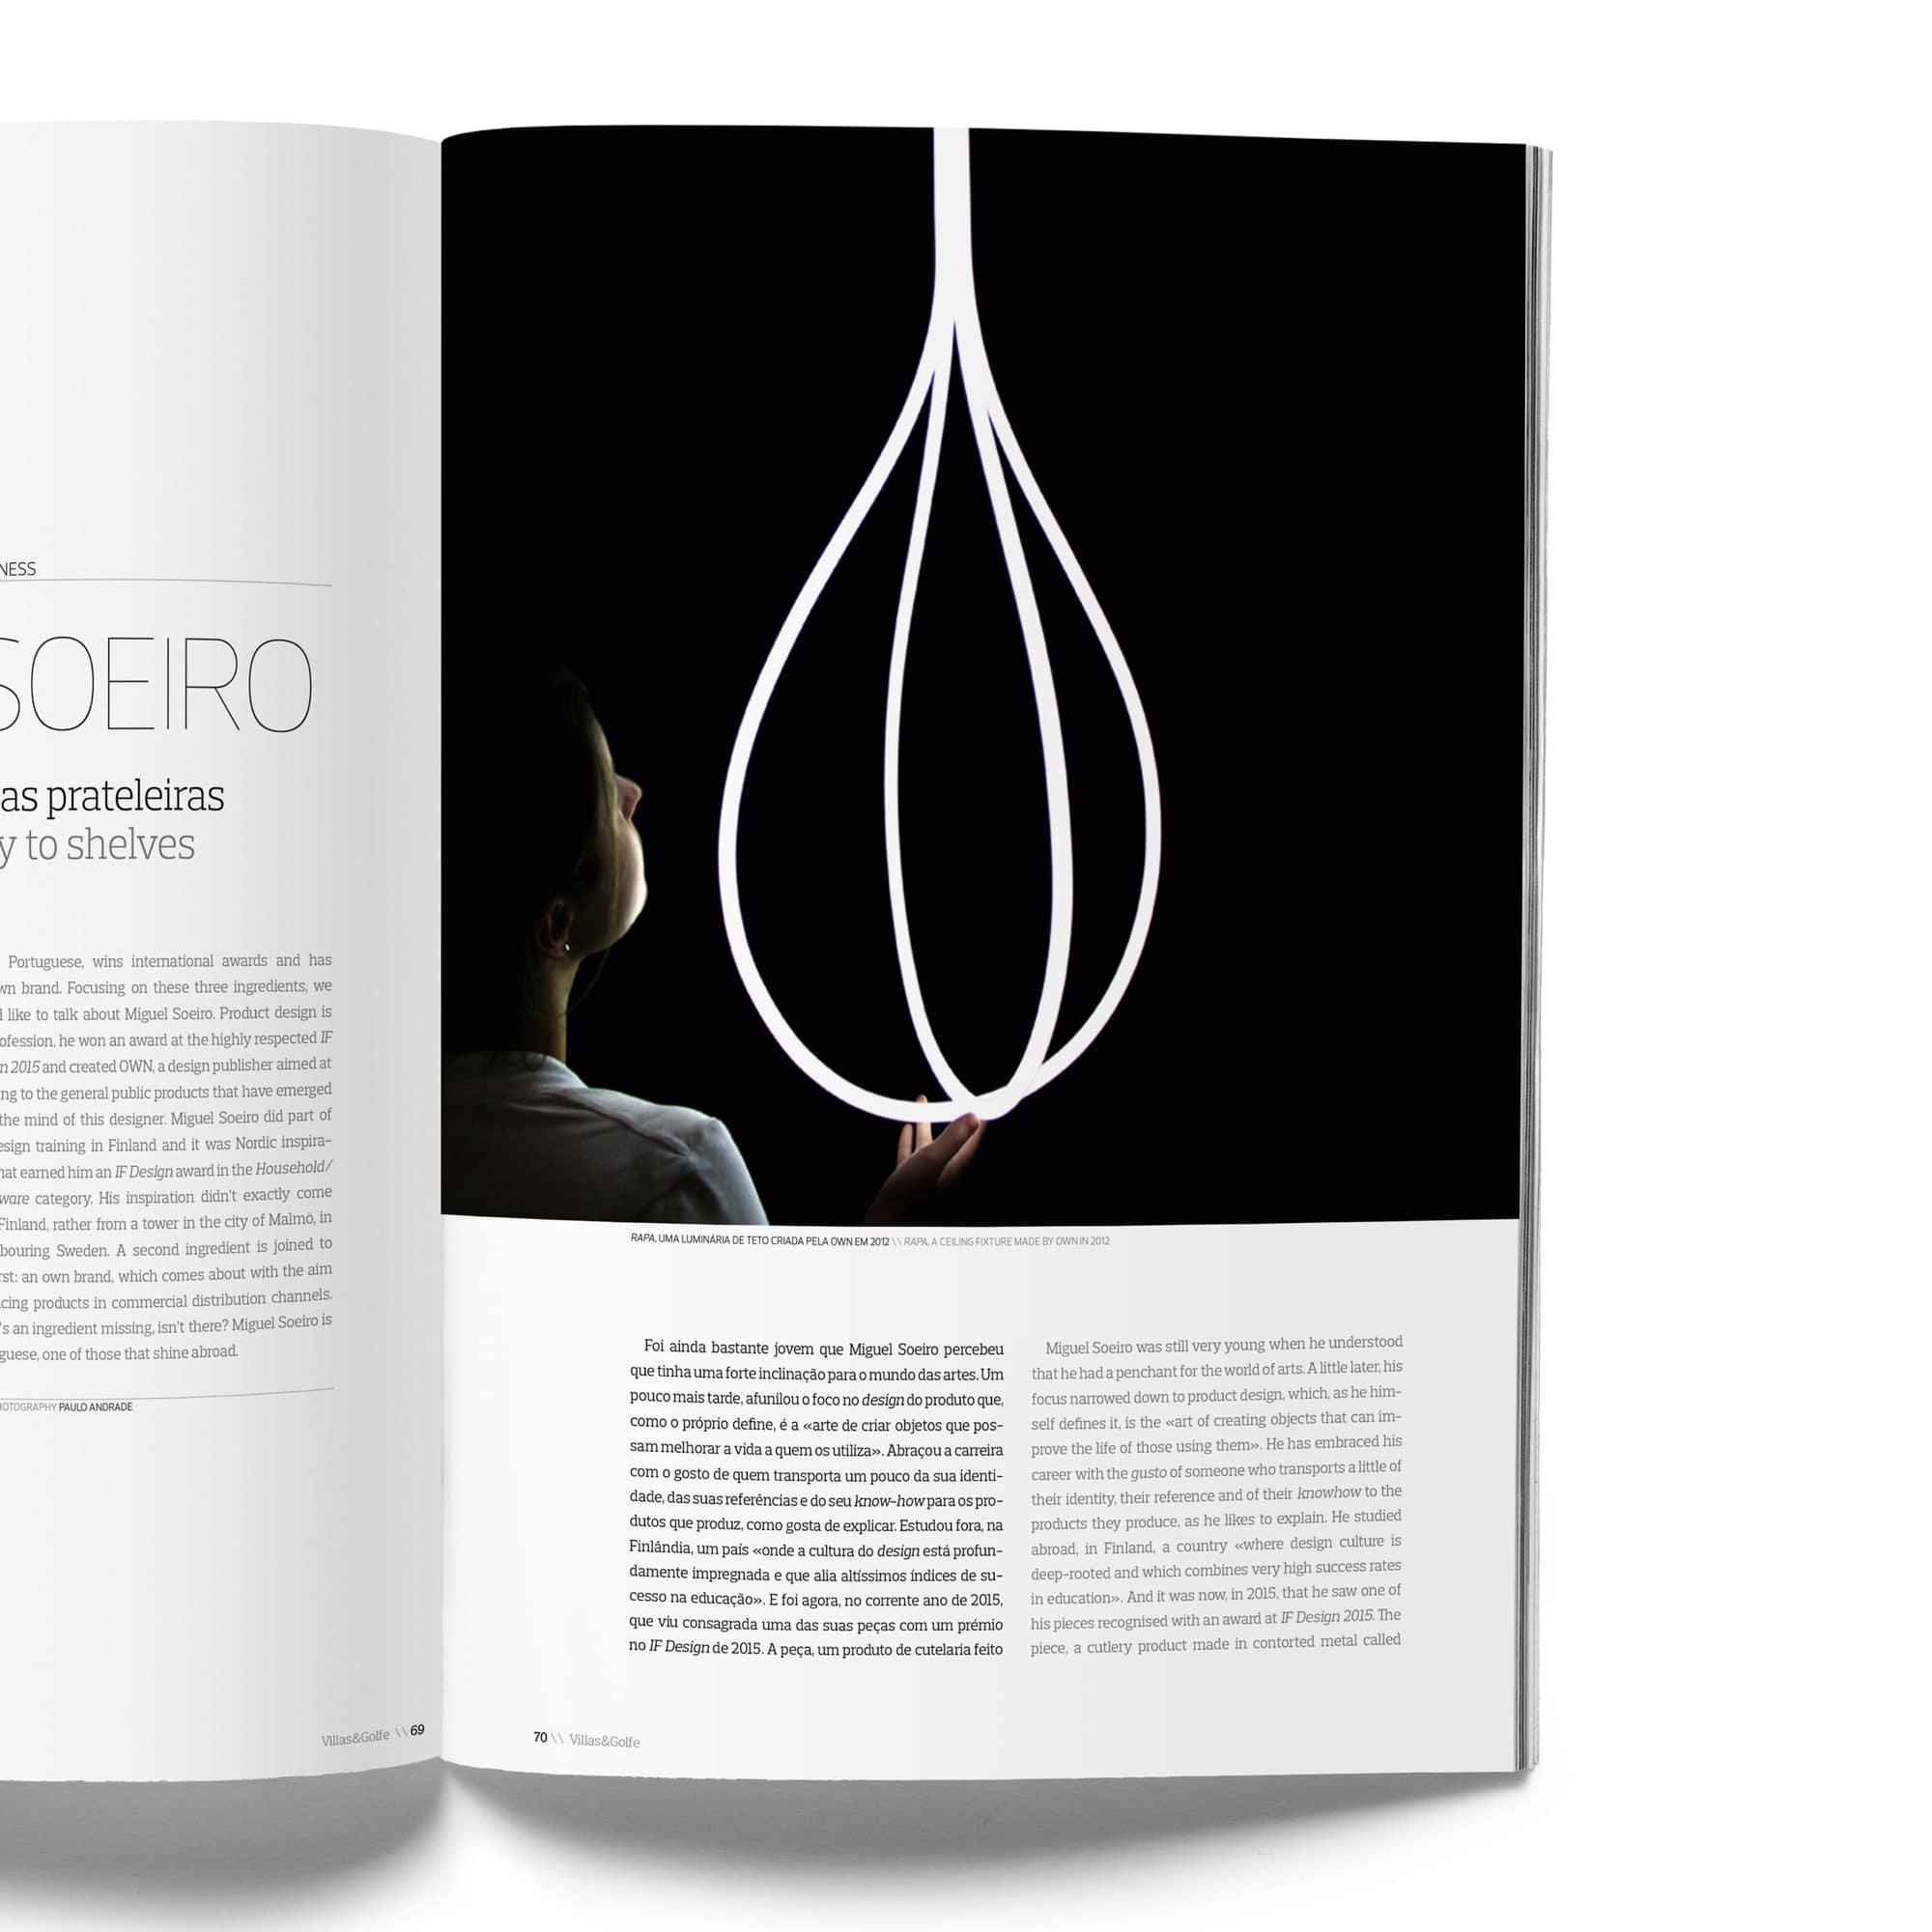 Villas & Golfe Inner Page Hanging Lamp - DESIGN BY MIGUEL SOEIRO